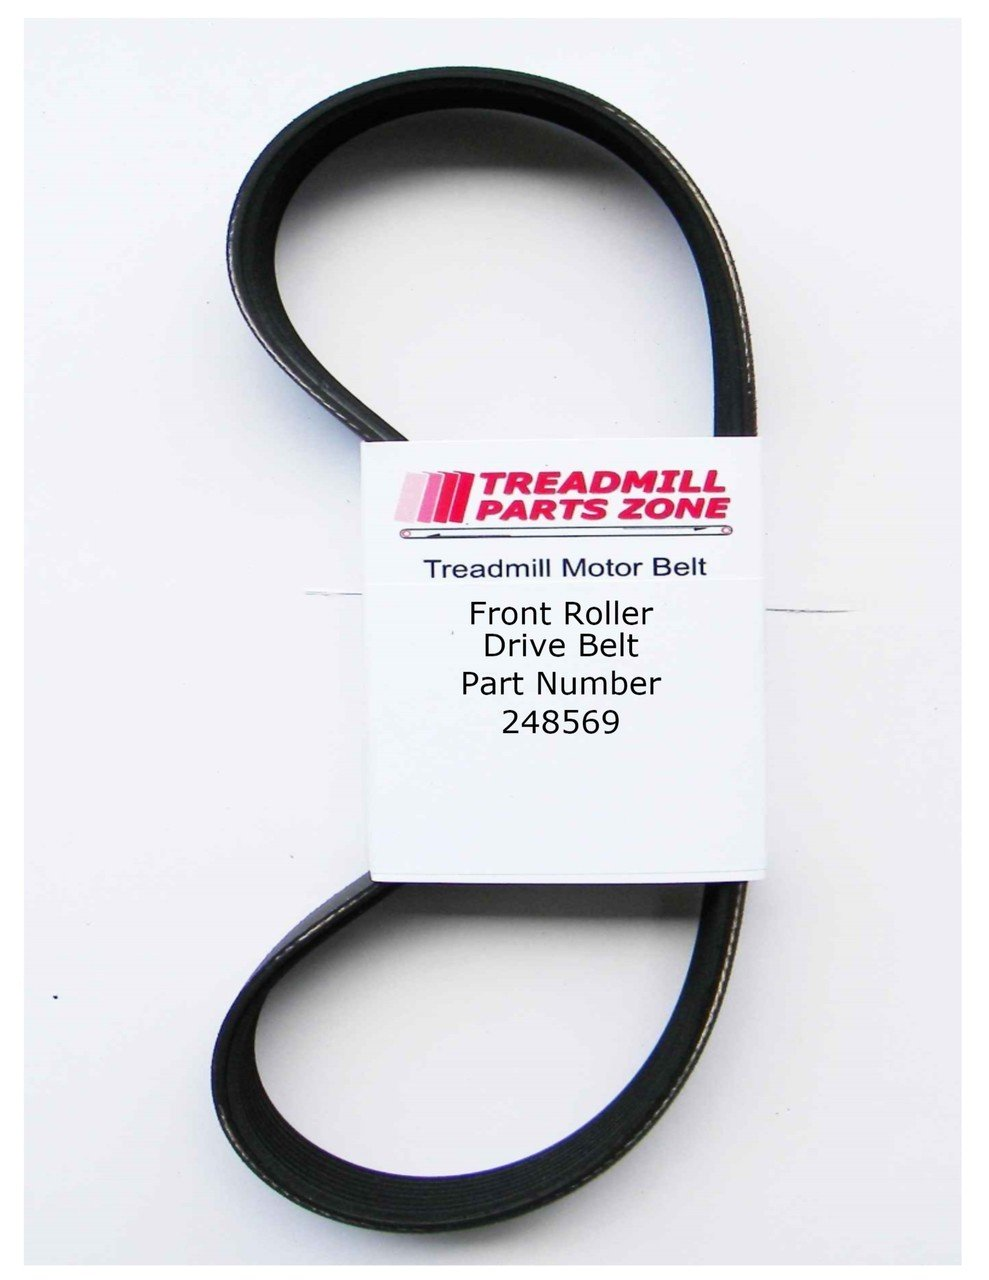 TREADMILL Model WETL407080 WEIDER WESLO COMPACT XL Motor Belt Part 248569 by TreadmillPartsZone